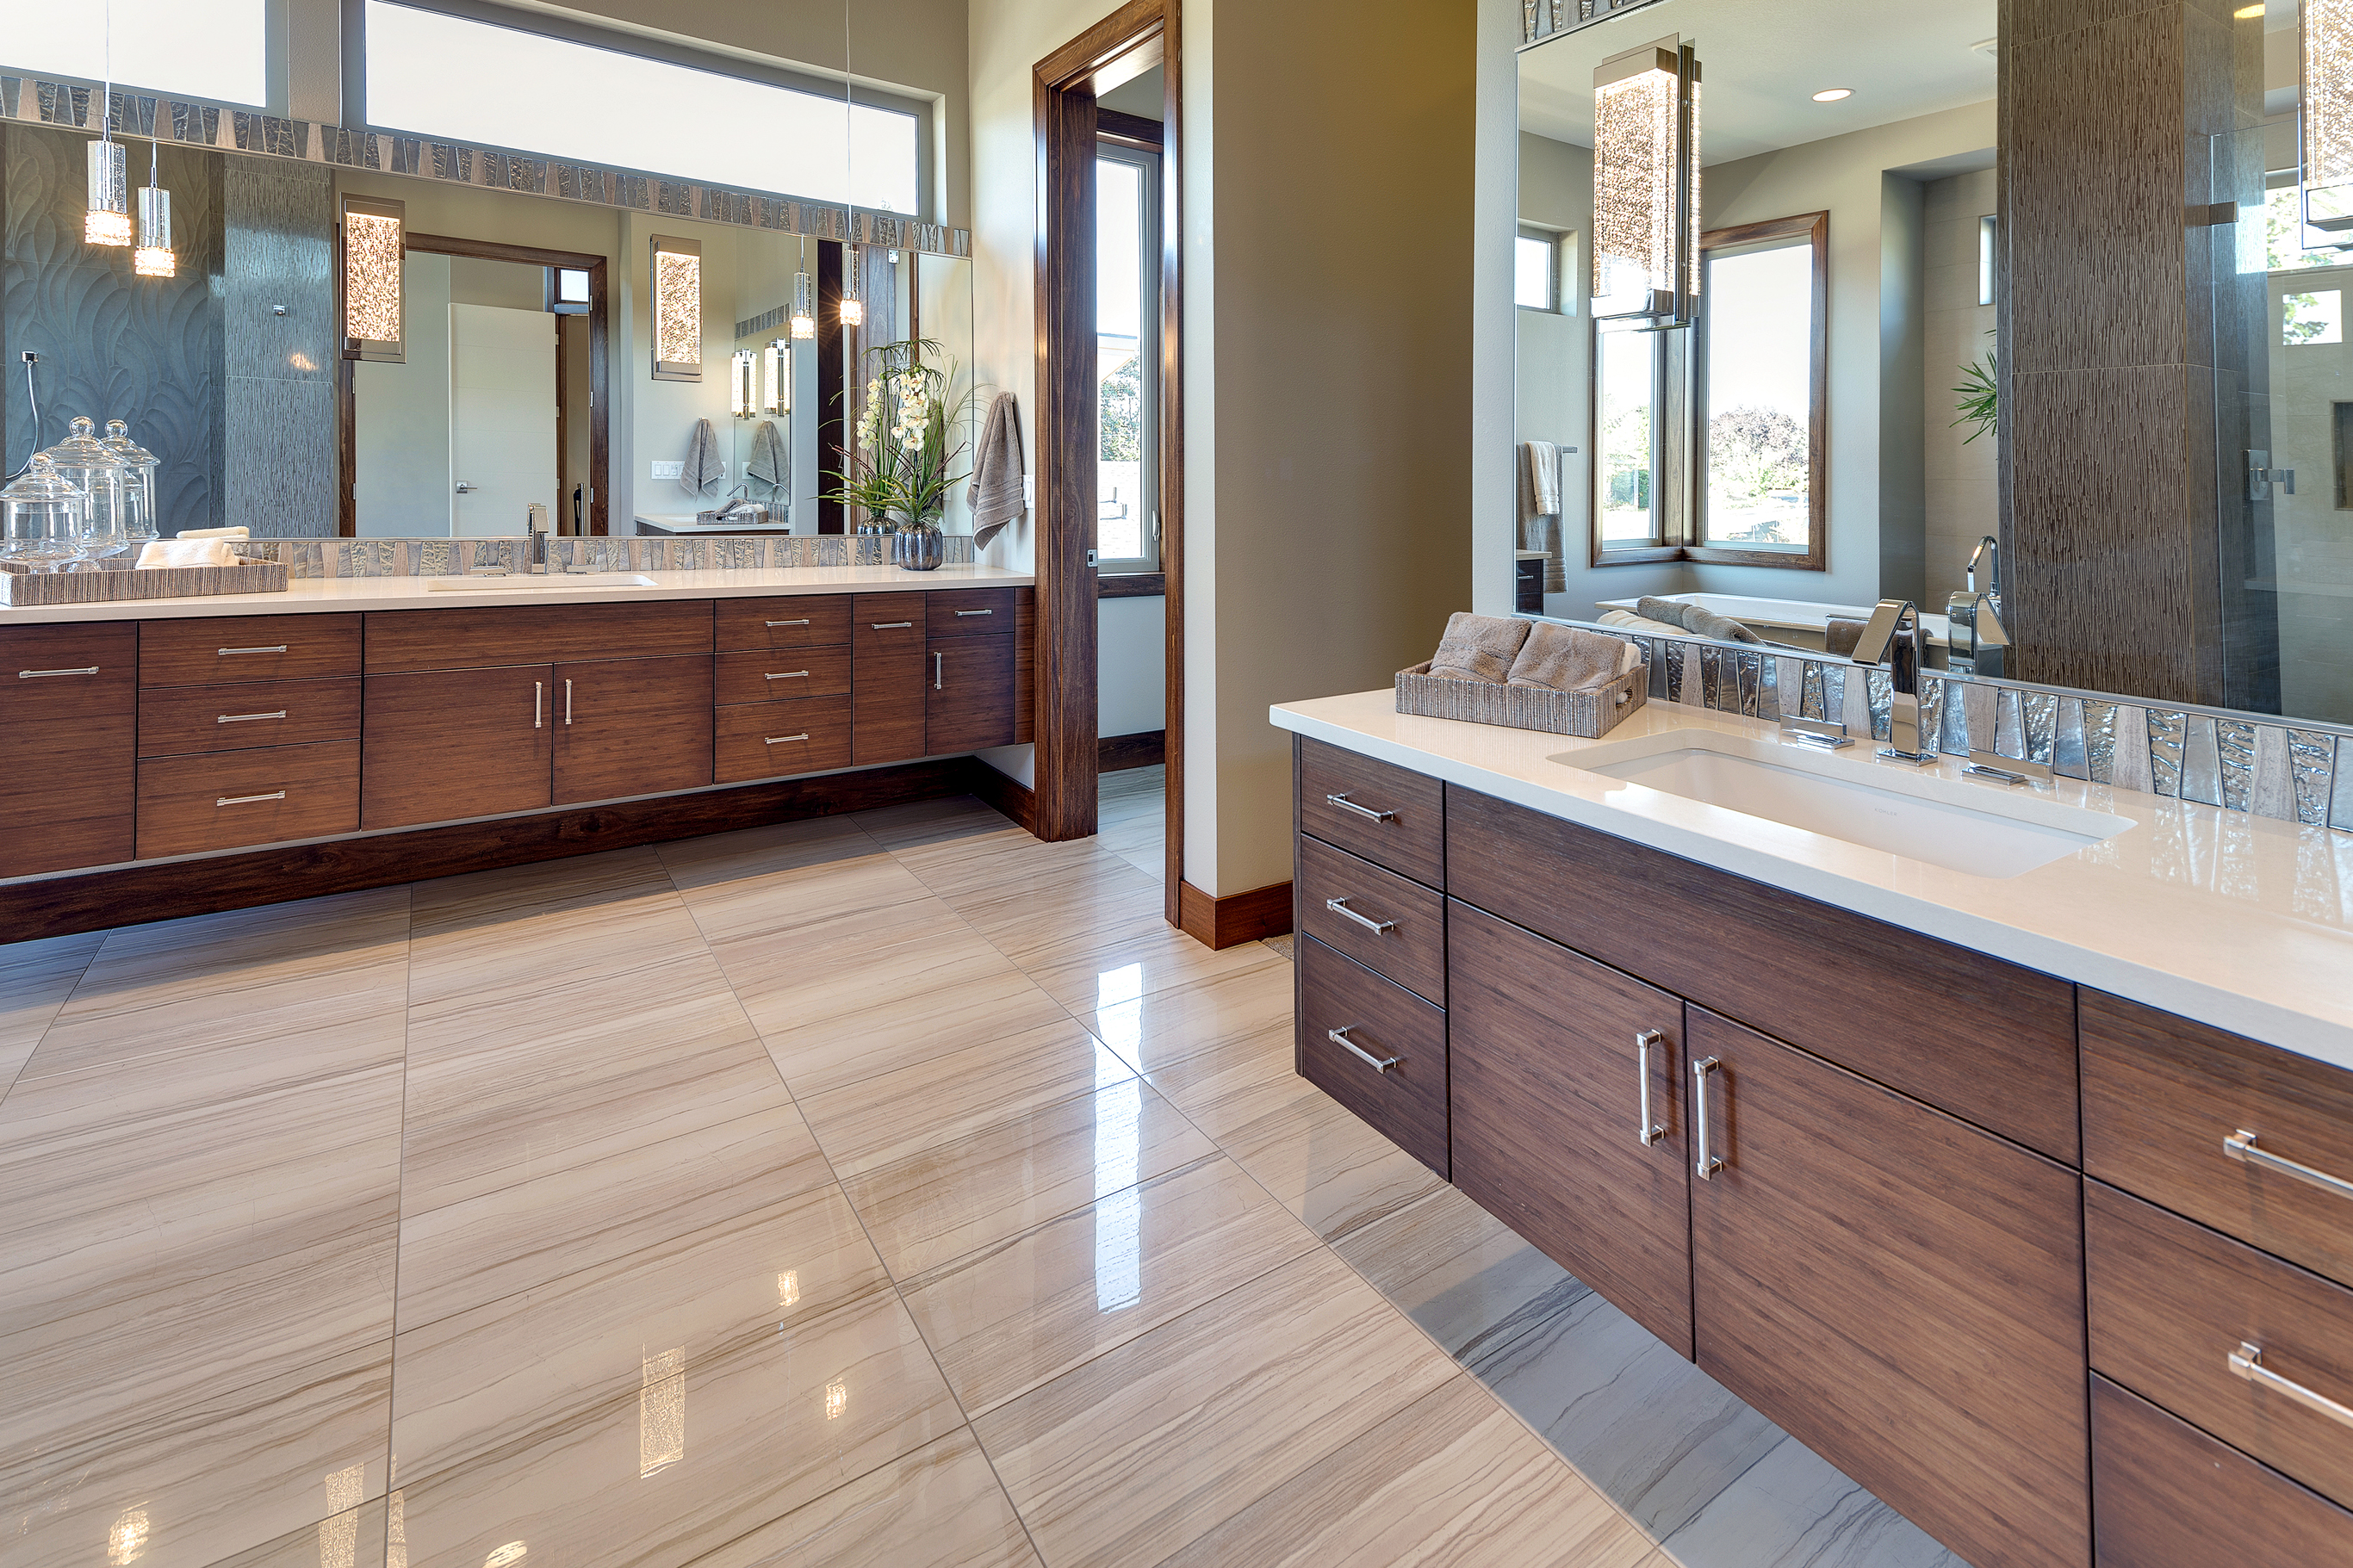 Modern Bamboo Bathroom Cabinets